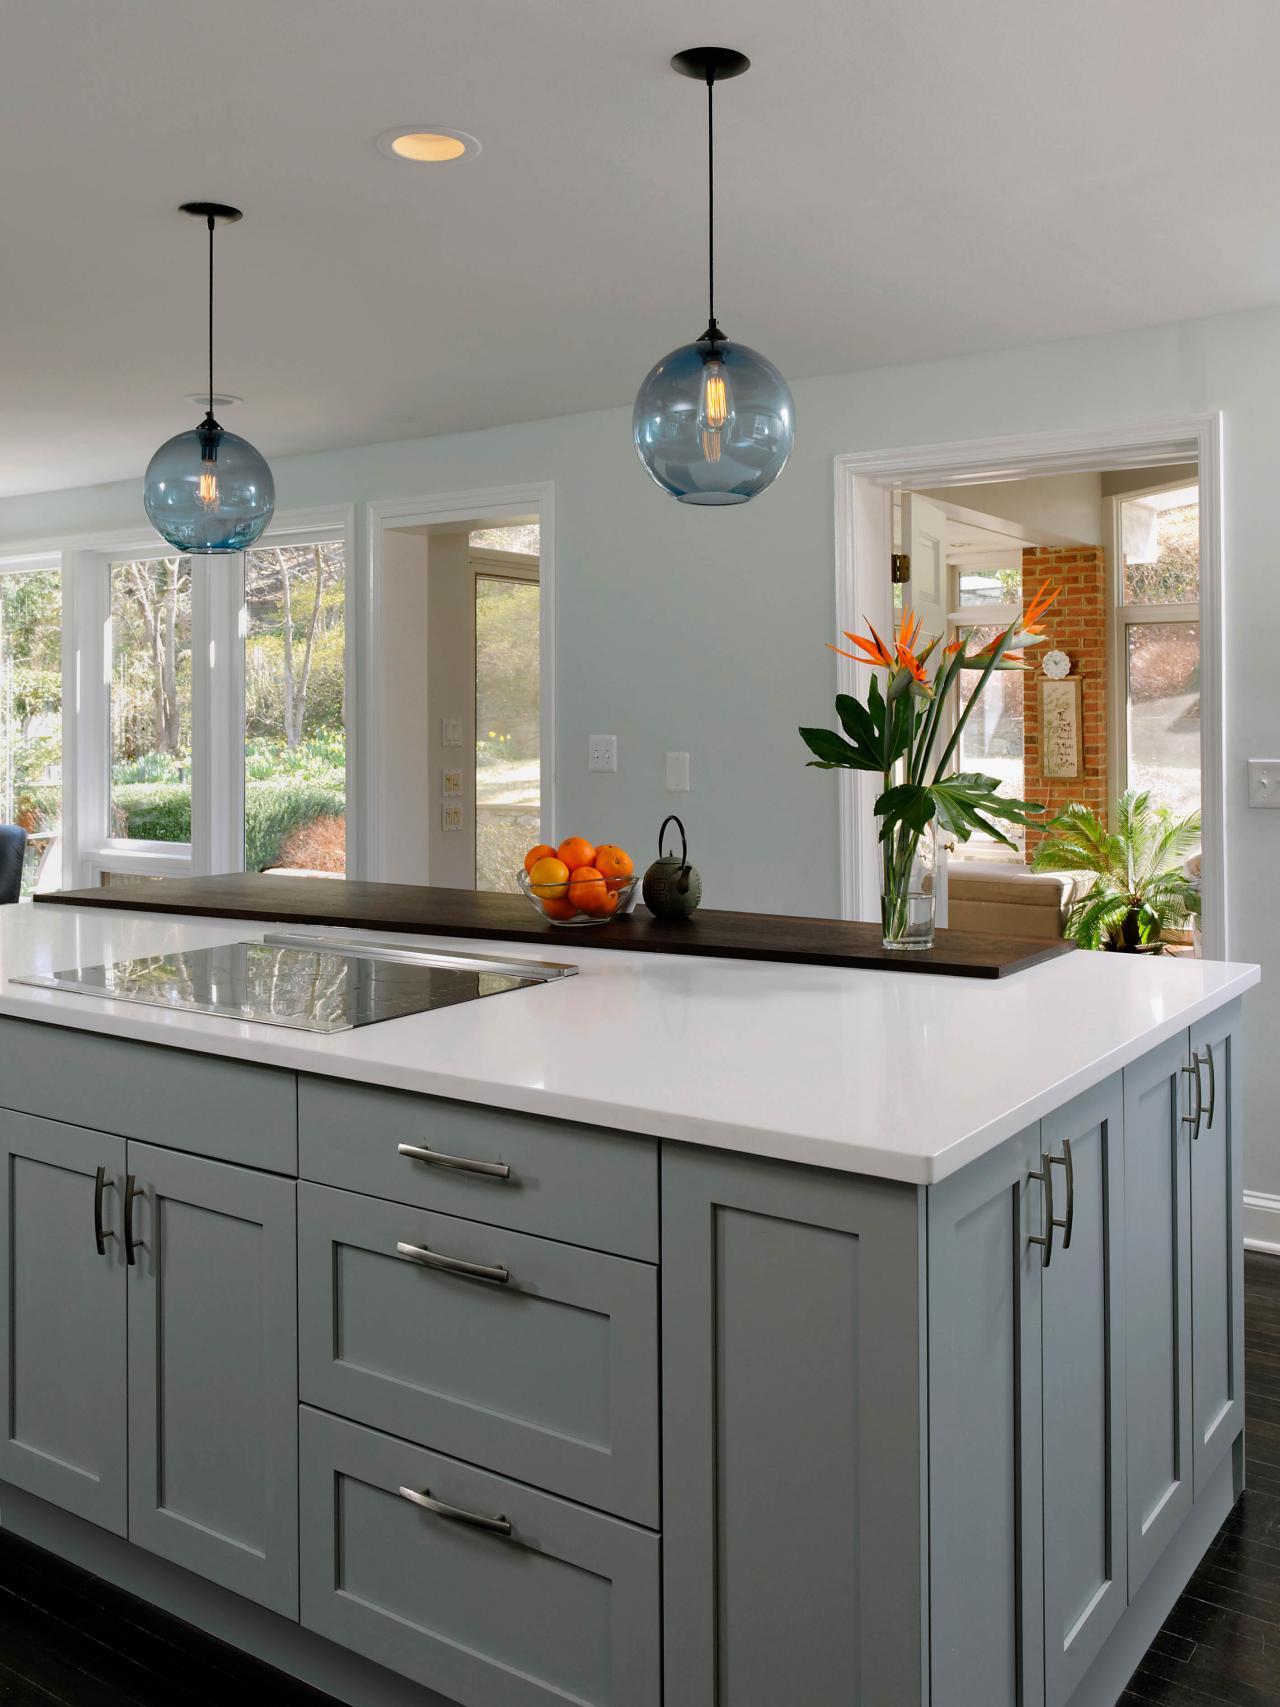 kitchen cabinets ideas colors photo - 5